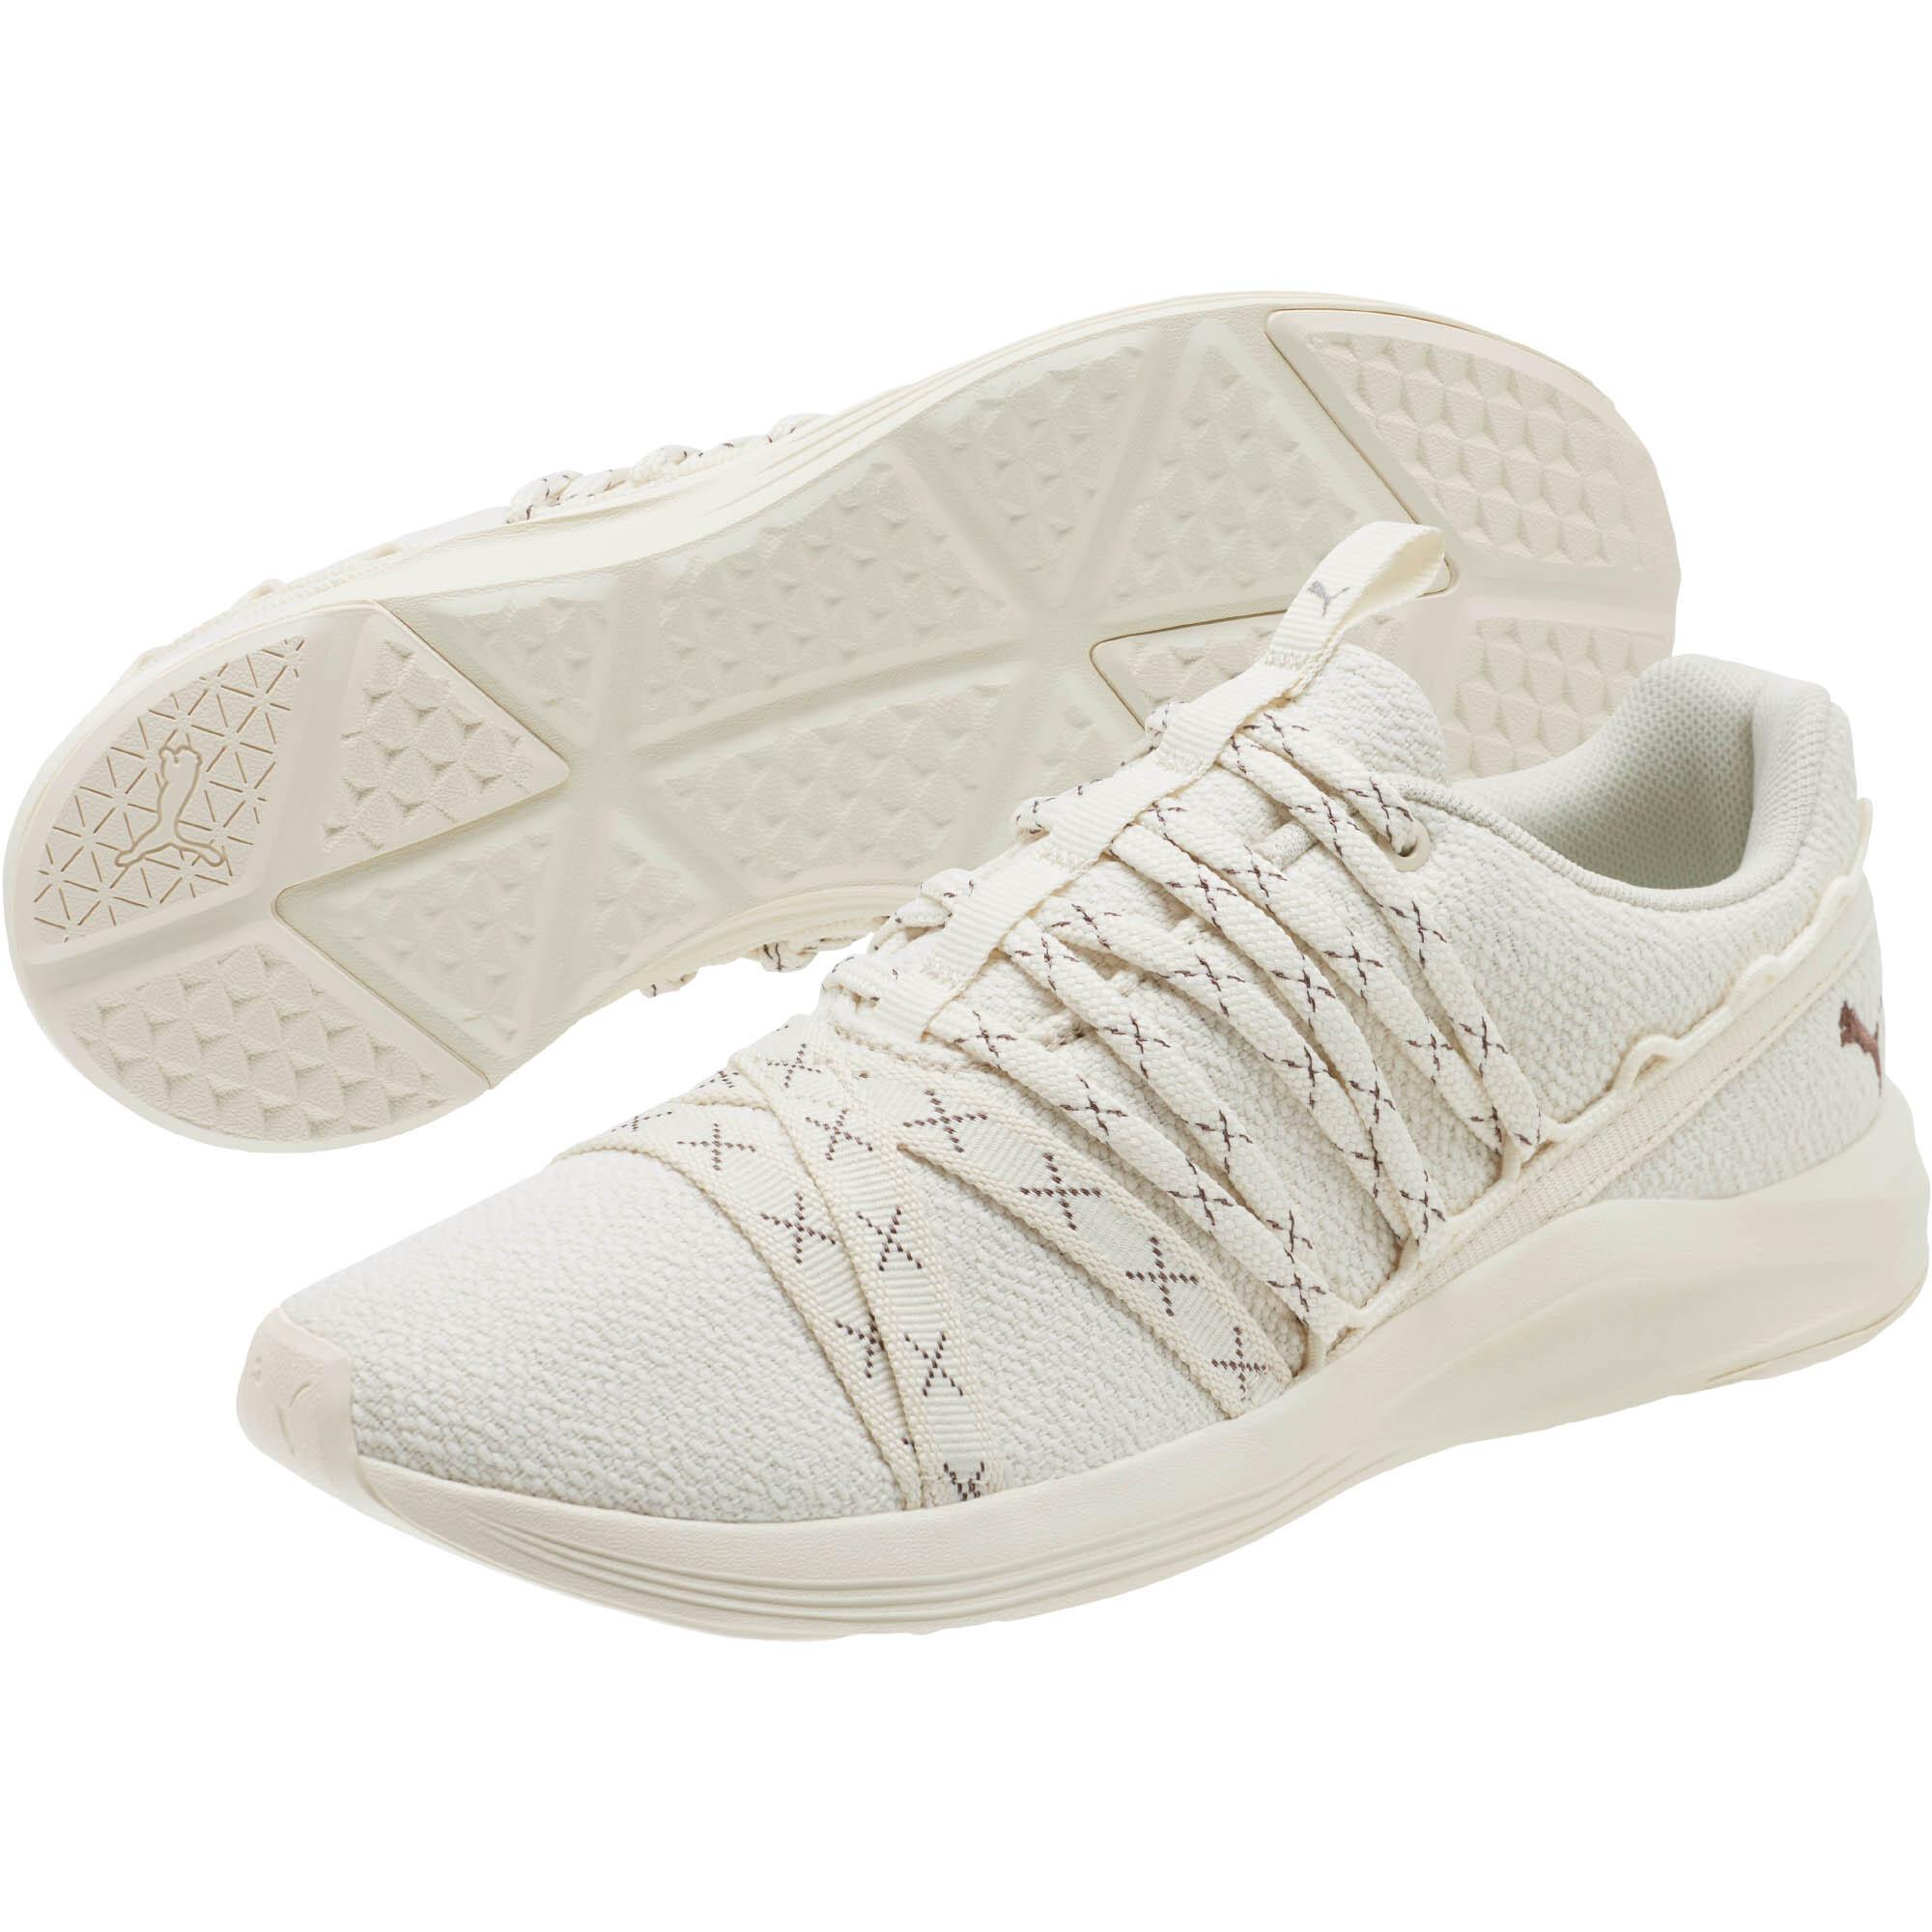 PUMA-Prowl-Alt-2-LX-Women-039-s-Training-Shoes-Women-Shoe-Training thumbnail 8